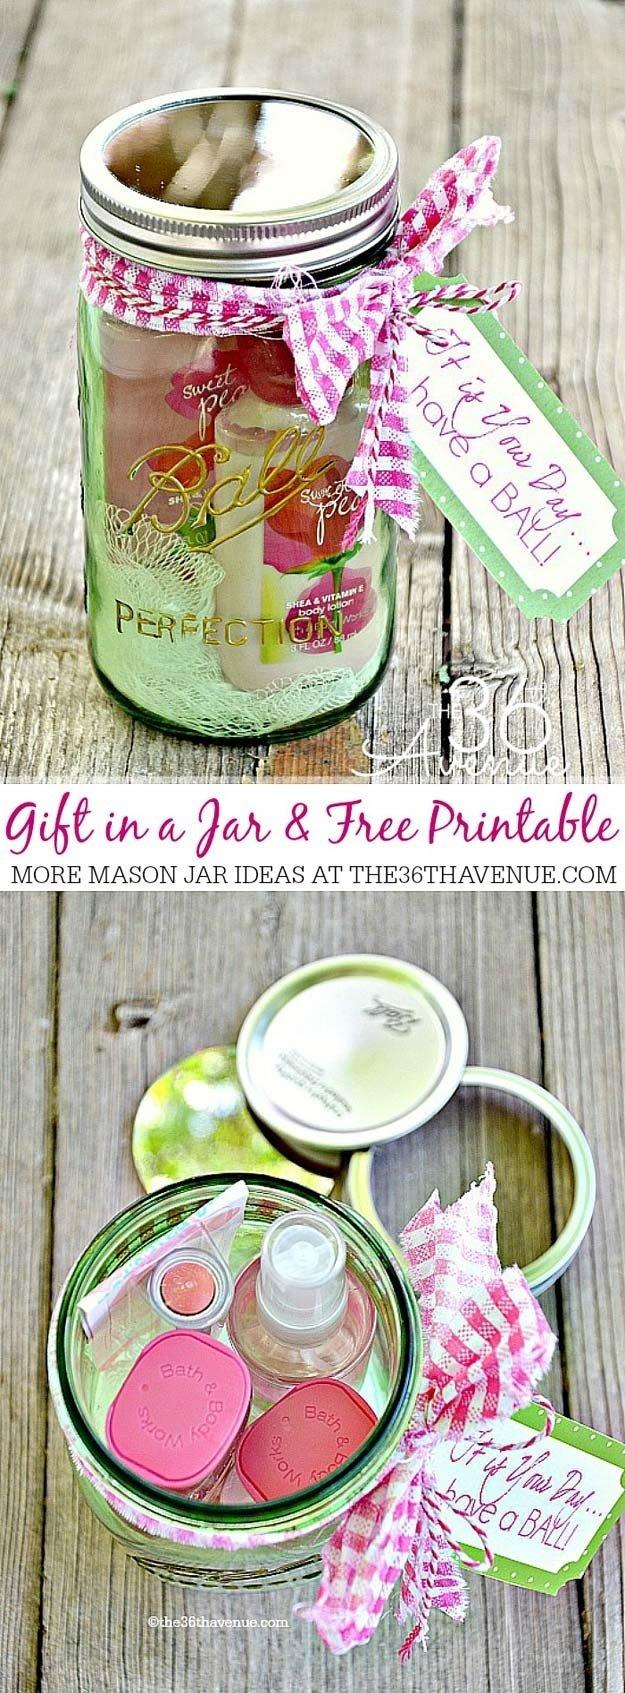 10 Ideal Diy Mason Jar Gift Ideas 47 cute mason jar gifts for teens 1 2020